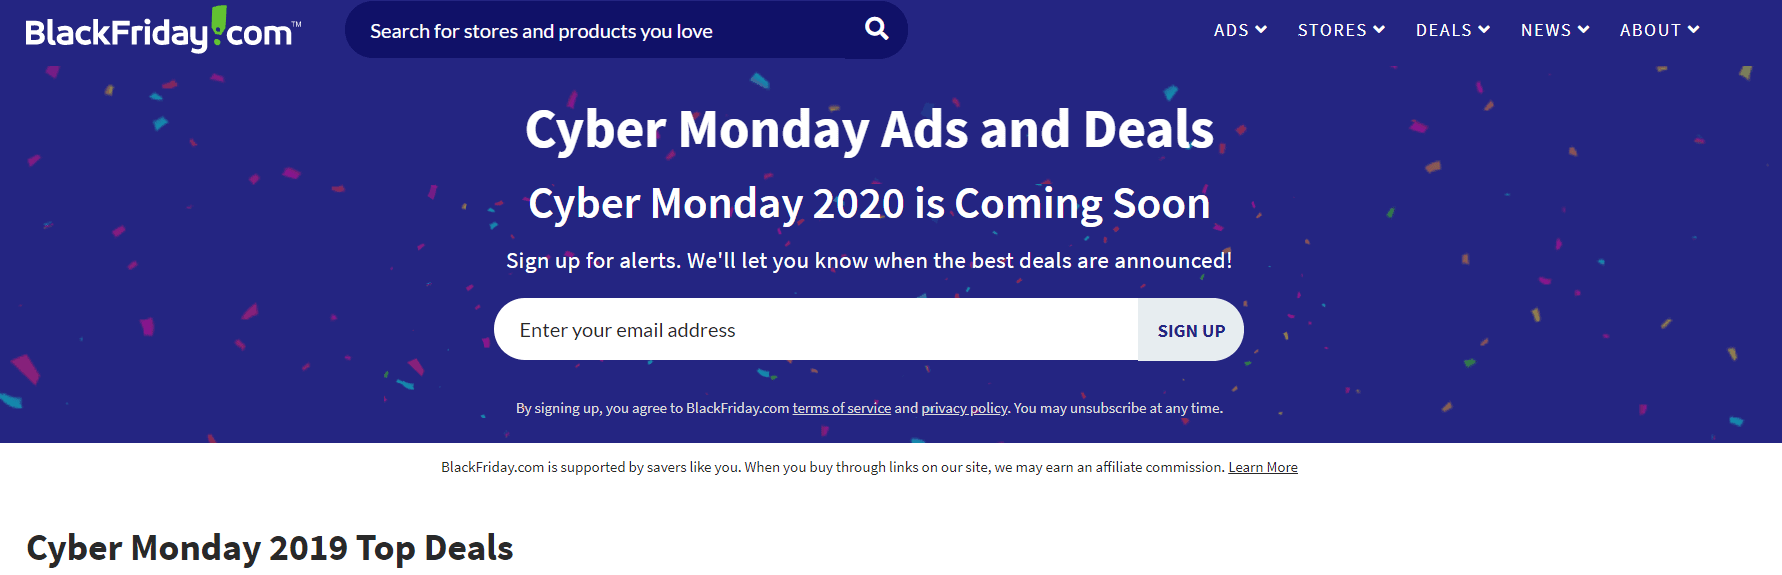 Black Friday Vs Cyber Monday Deals